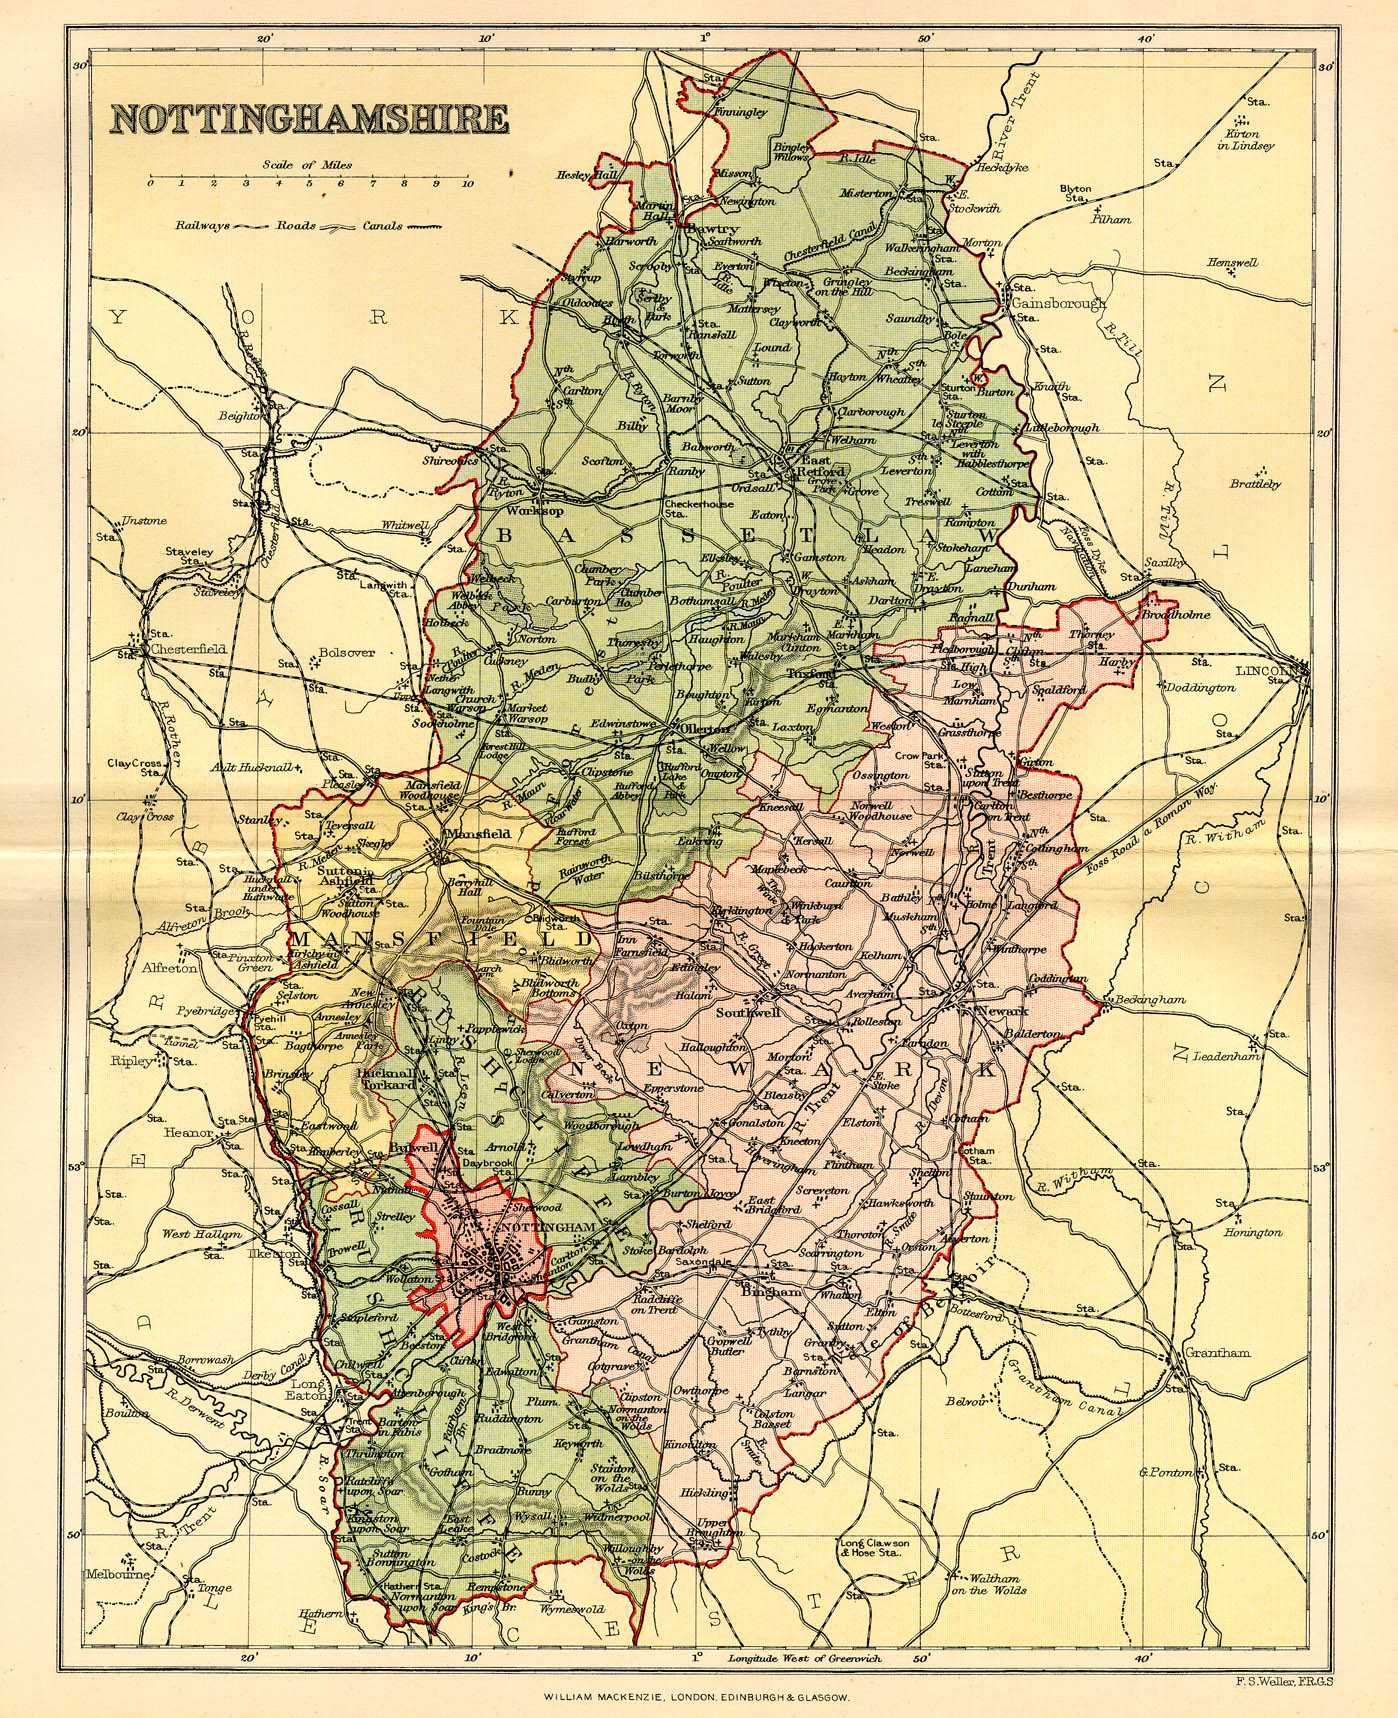 Nottingham map maps vintage Pinterest